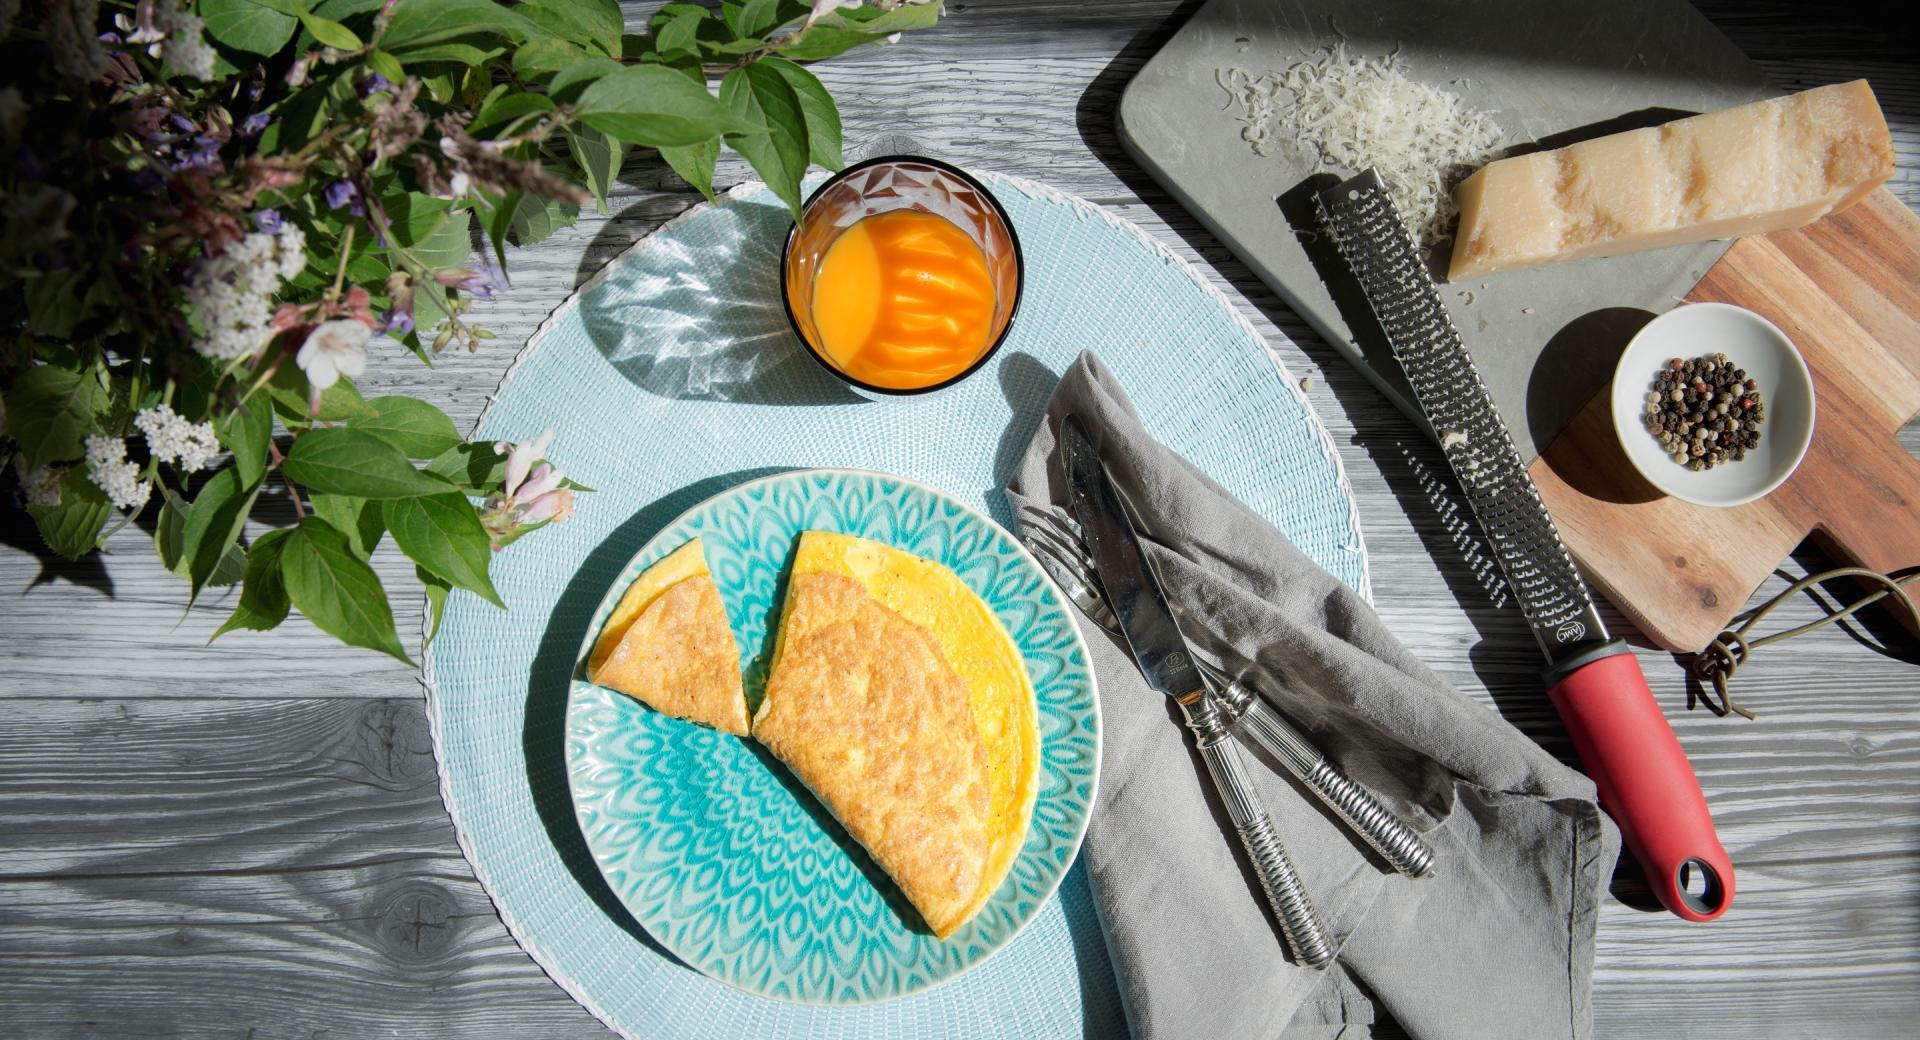 Omelette semplice con oPan